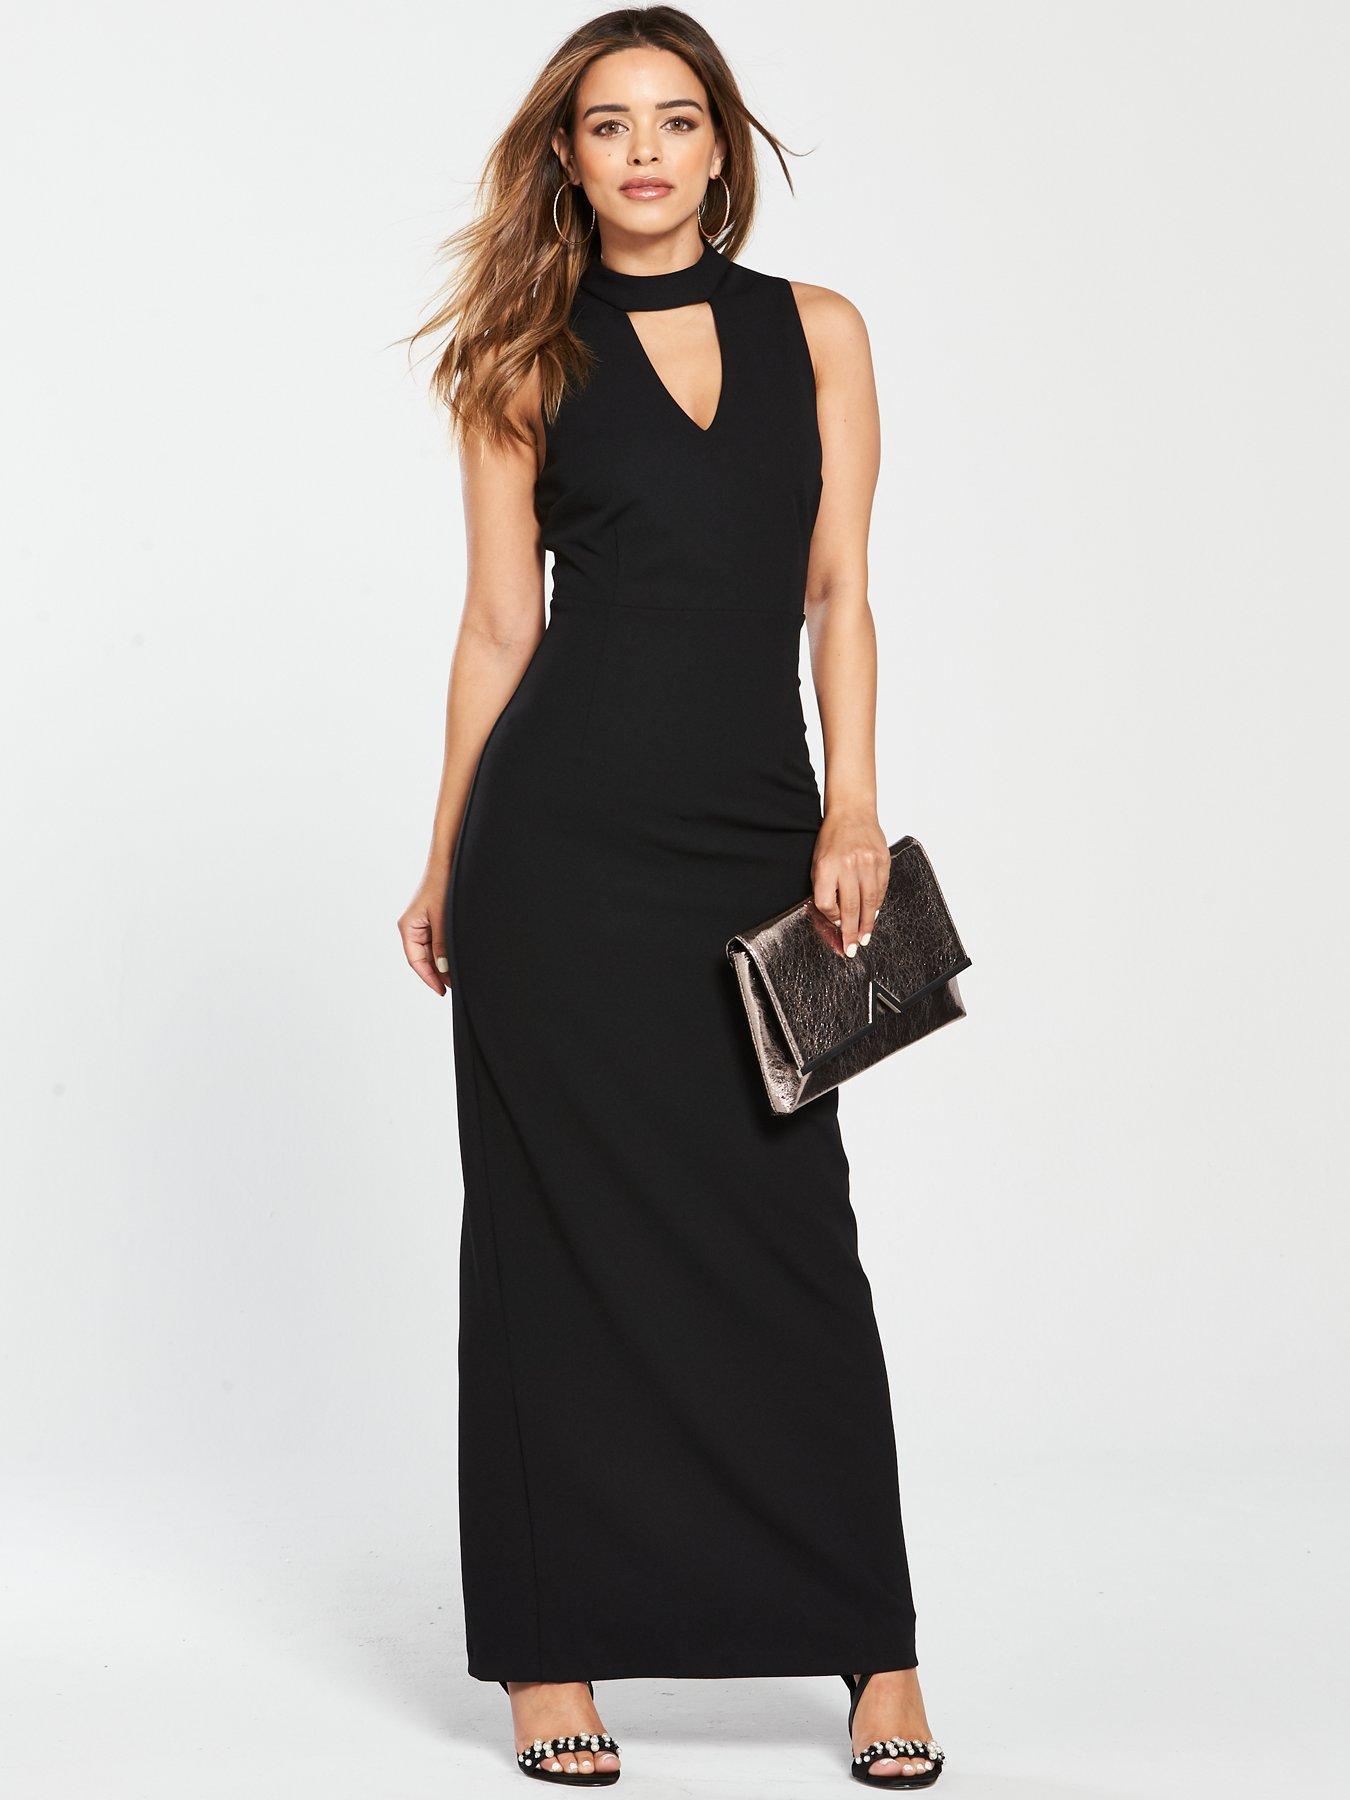 Clearance Maxi Dresses